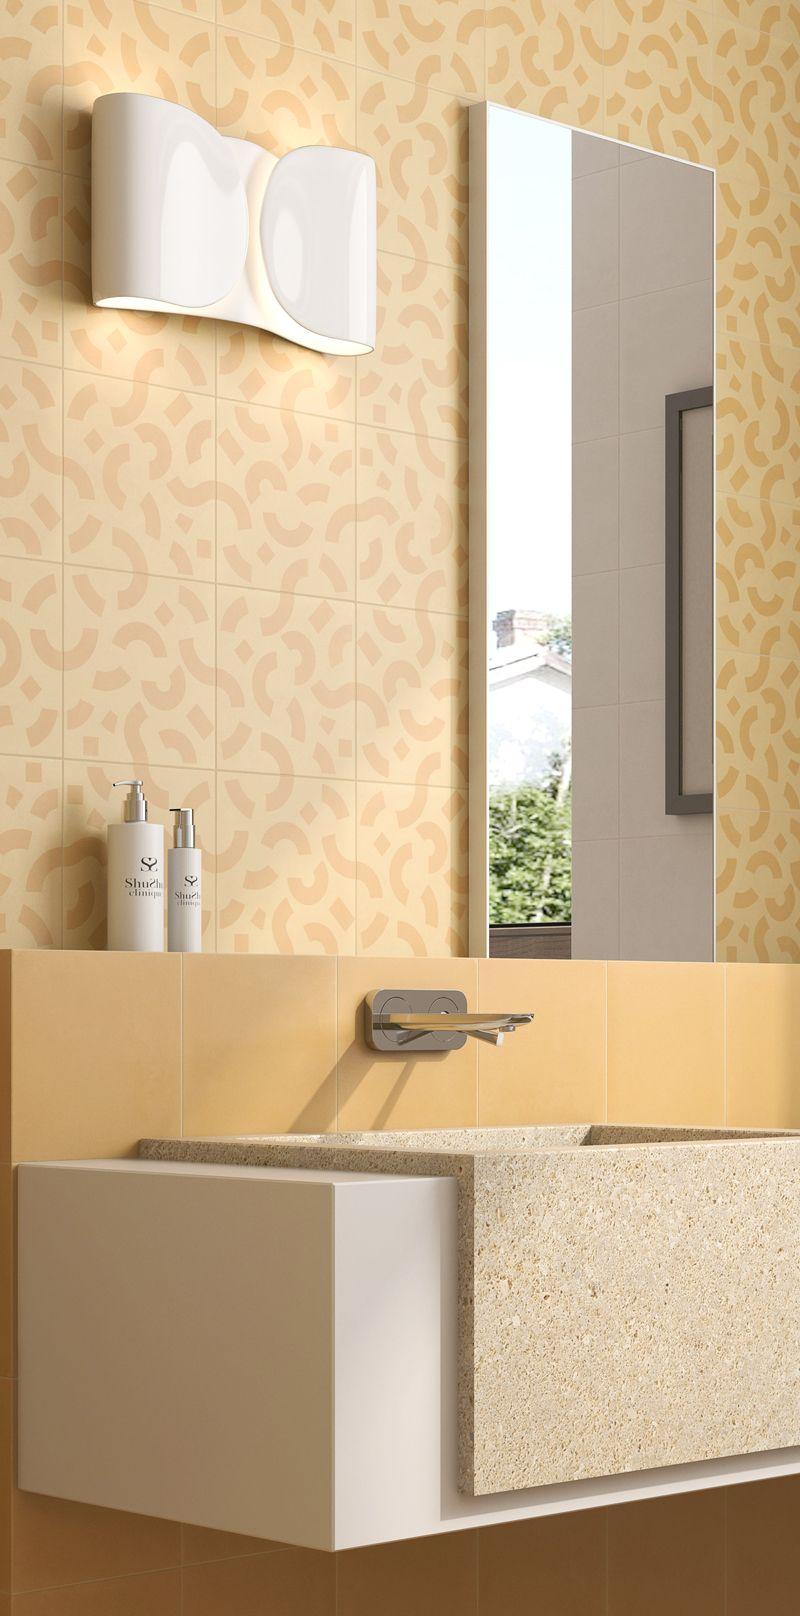 Bathroom Ceramic Tile Design Fascinating Trending #bathroom Ceramic Tiles Design An Exclusive #bathroom Review